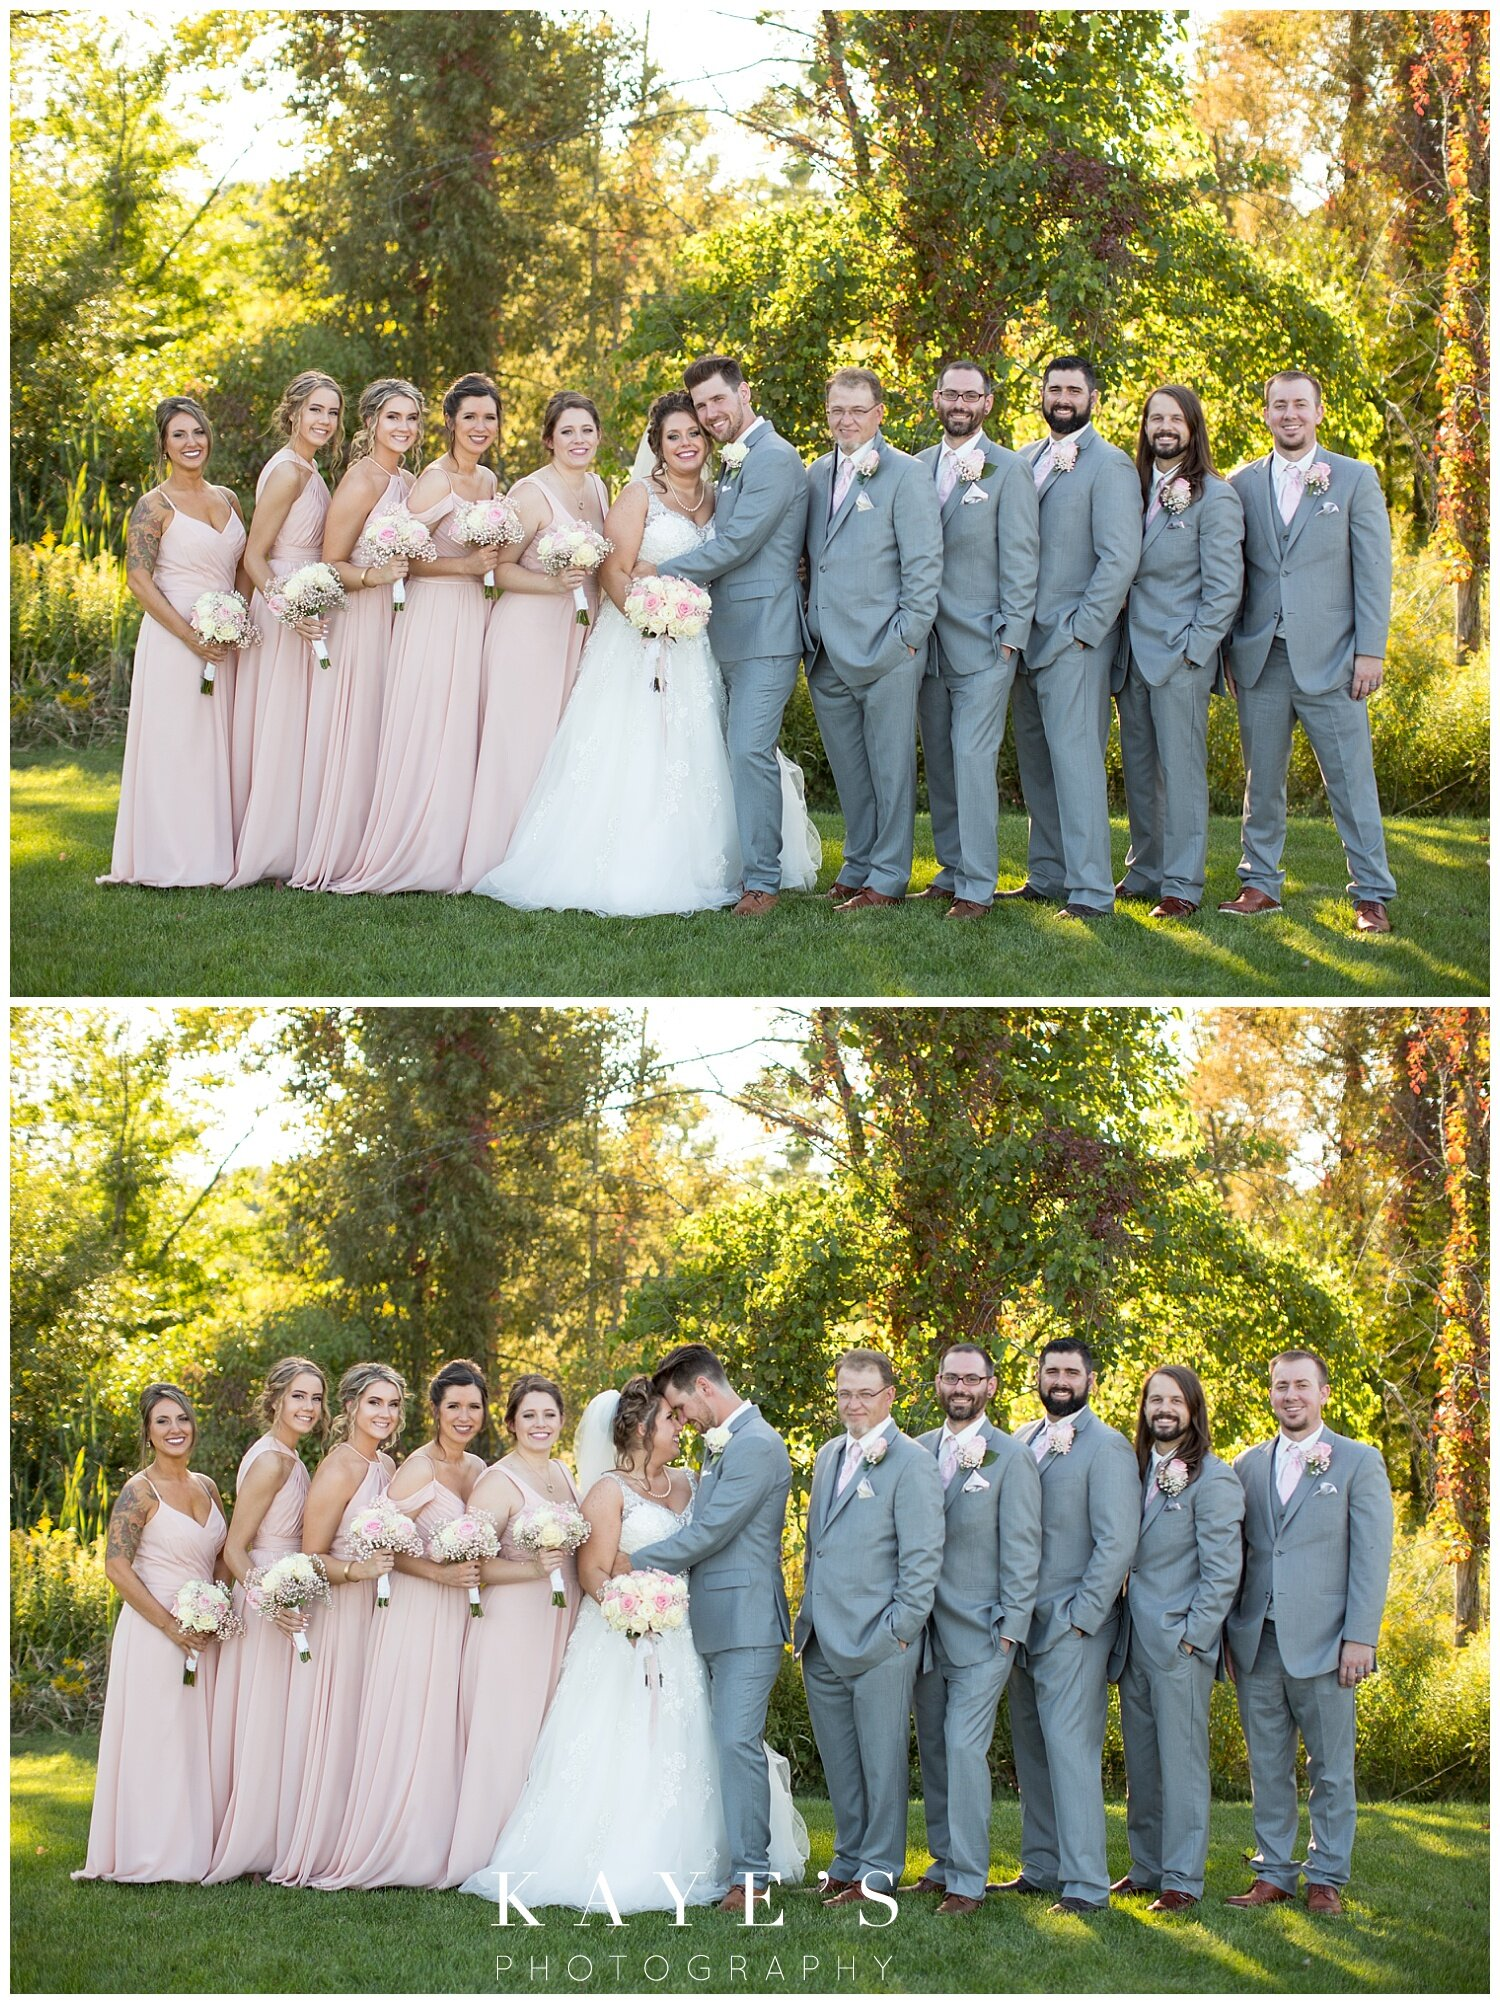 Captains-club-grand-blanc-michigan-wedding_0027.jpg